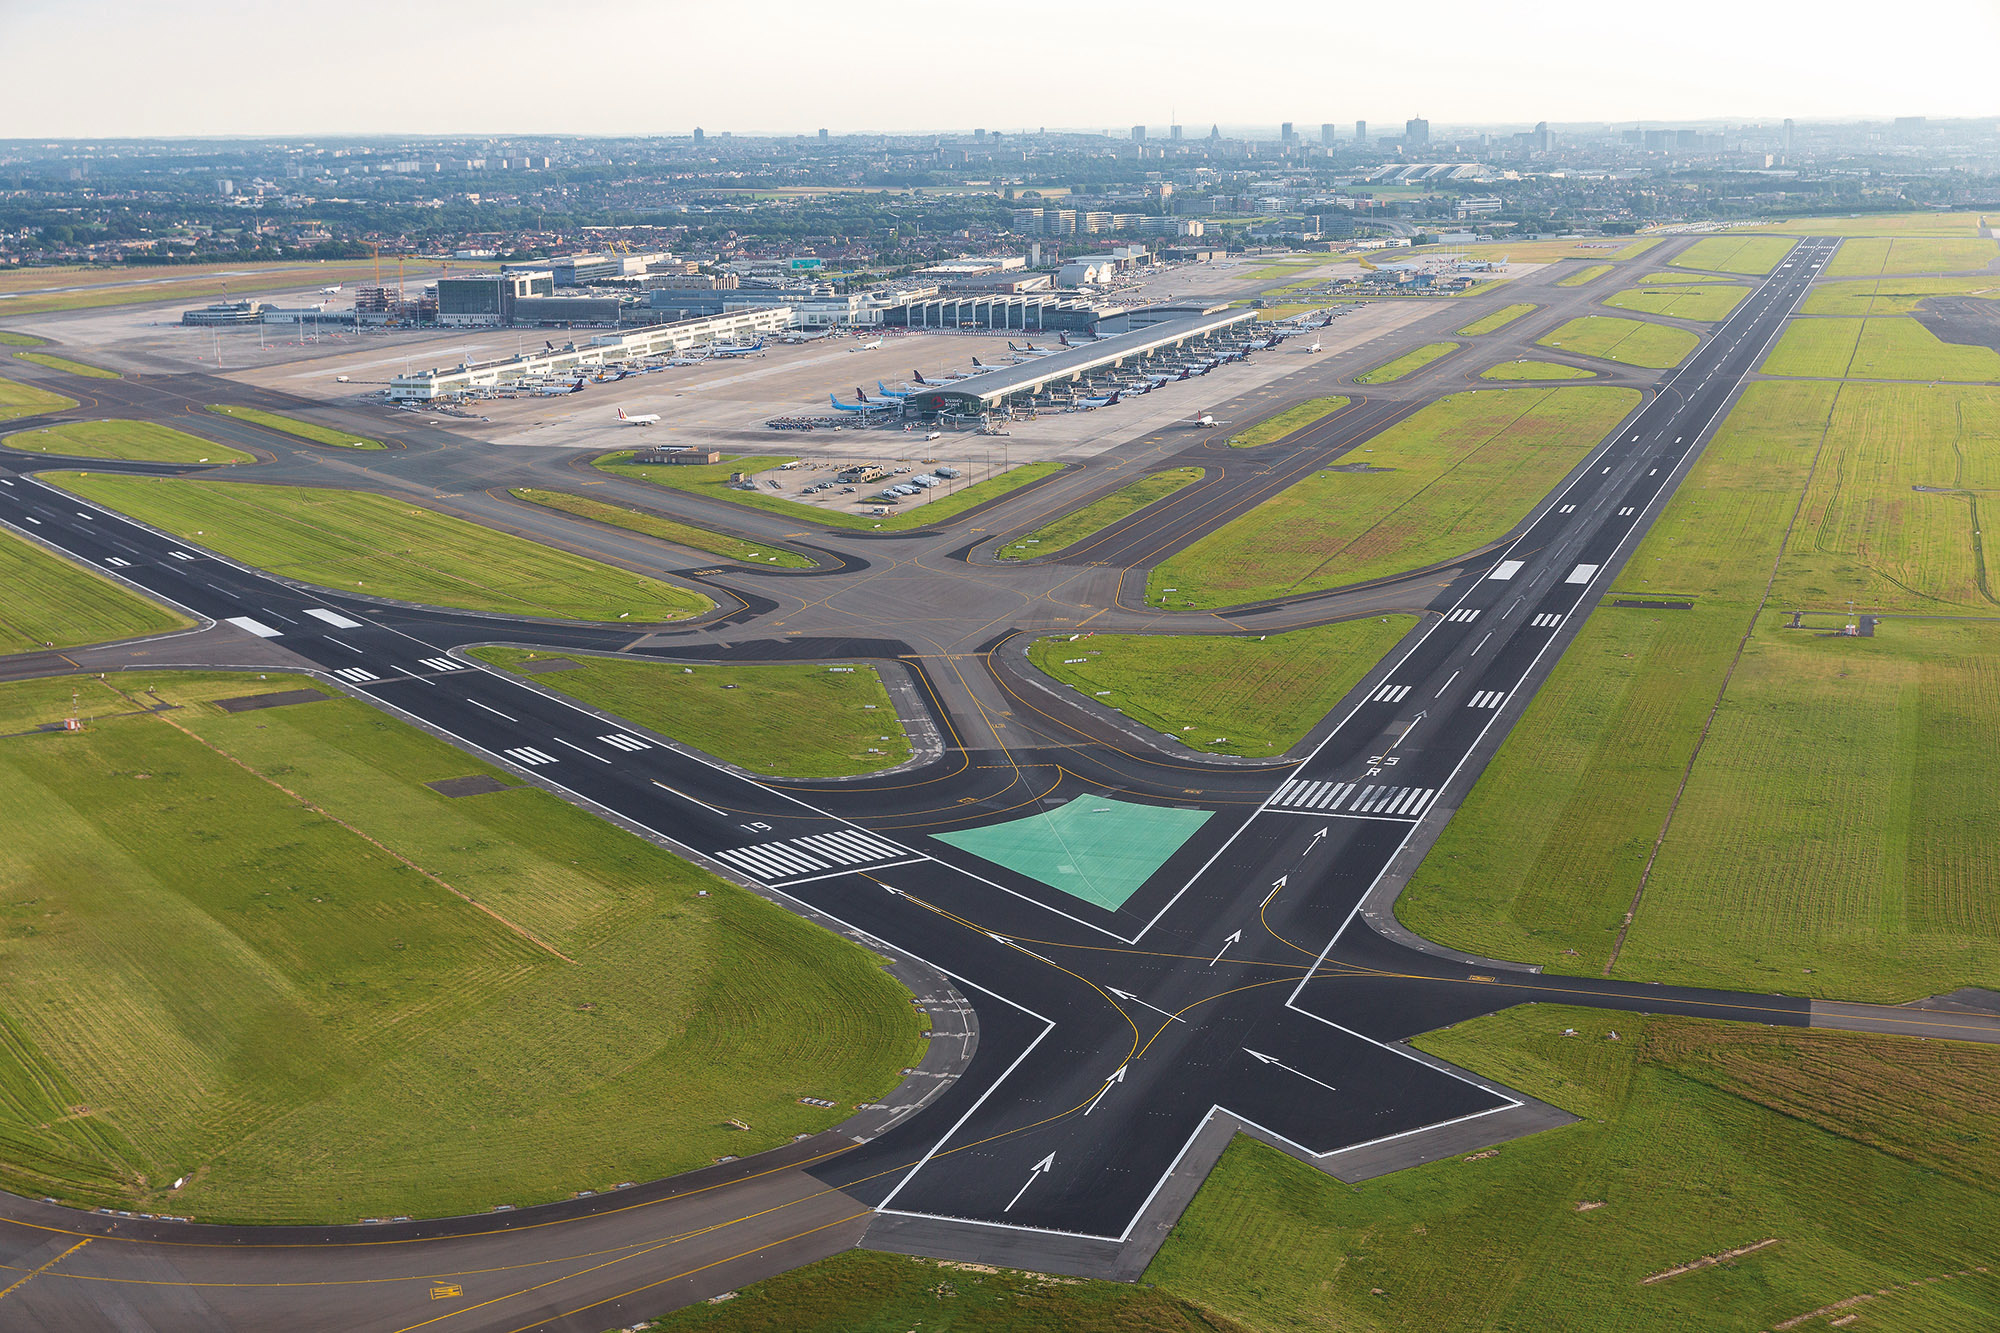 BRU Airport Overhead (Tom Dhaenens)